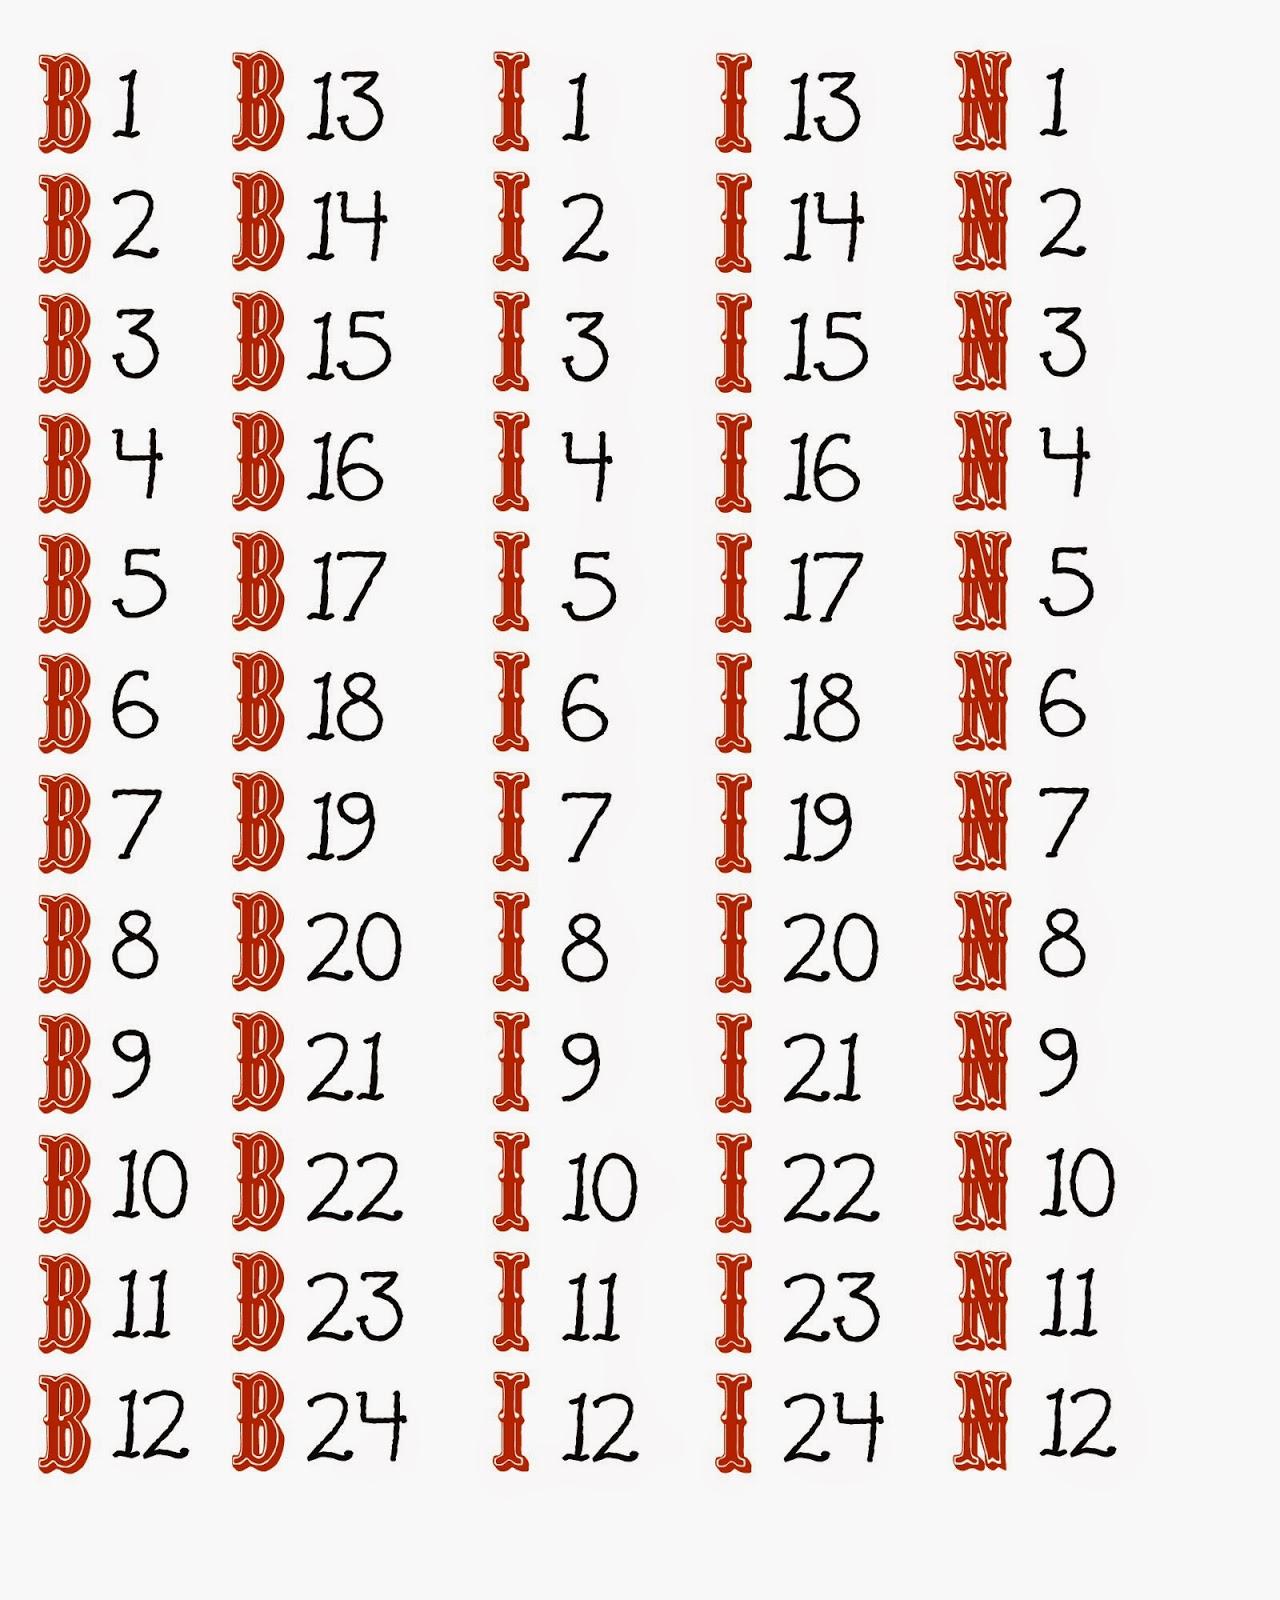 Free Printable Bingo Cards 1-75 That Are Dashing | Rodriguez